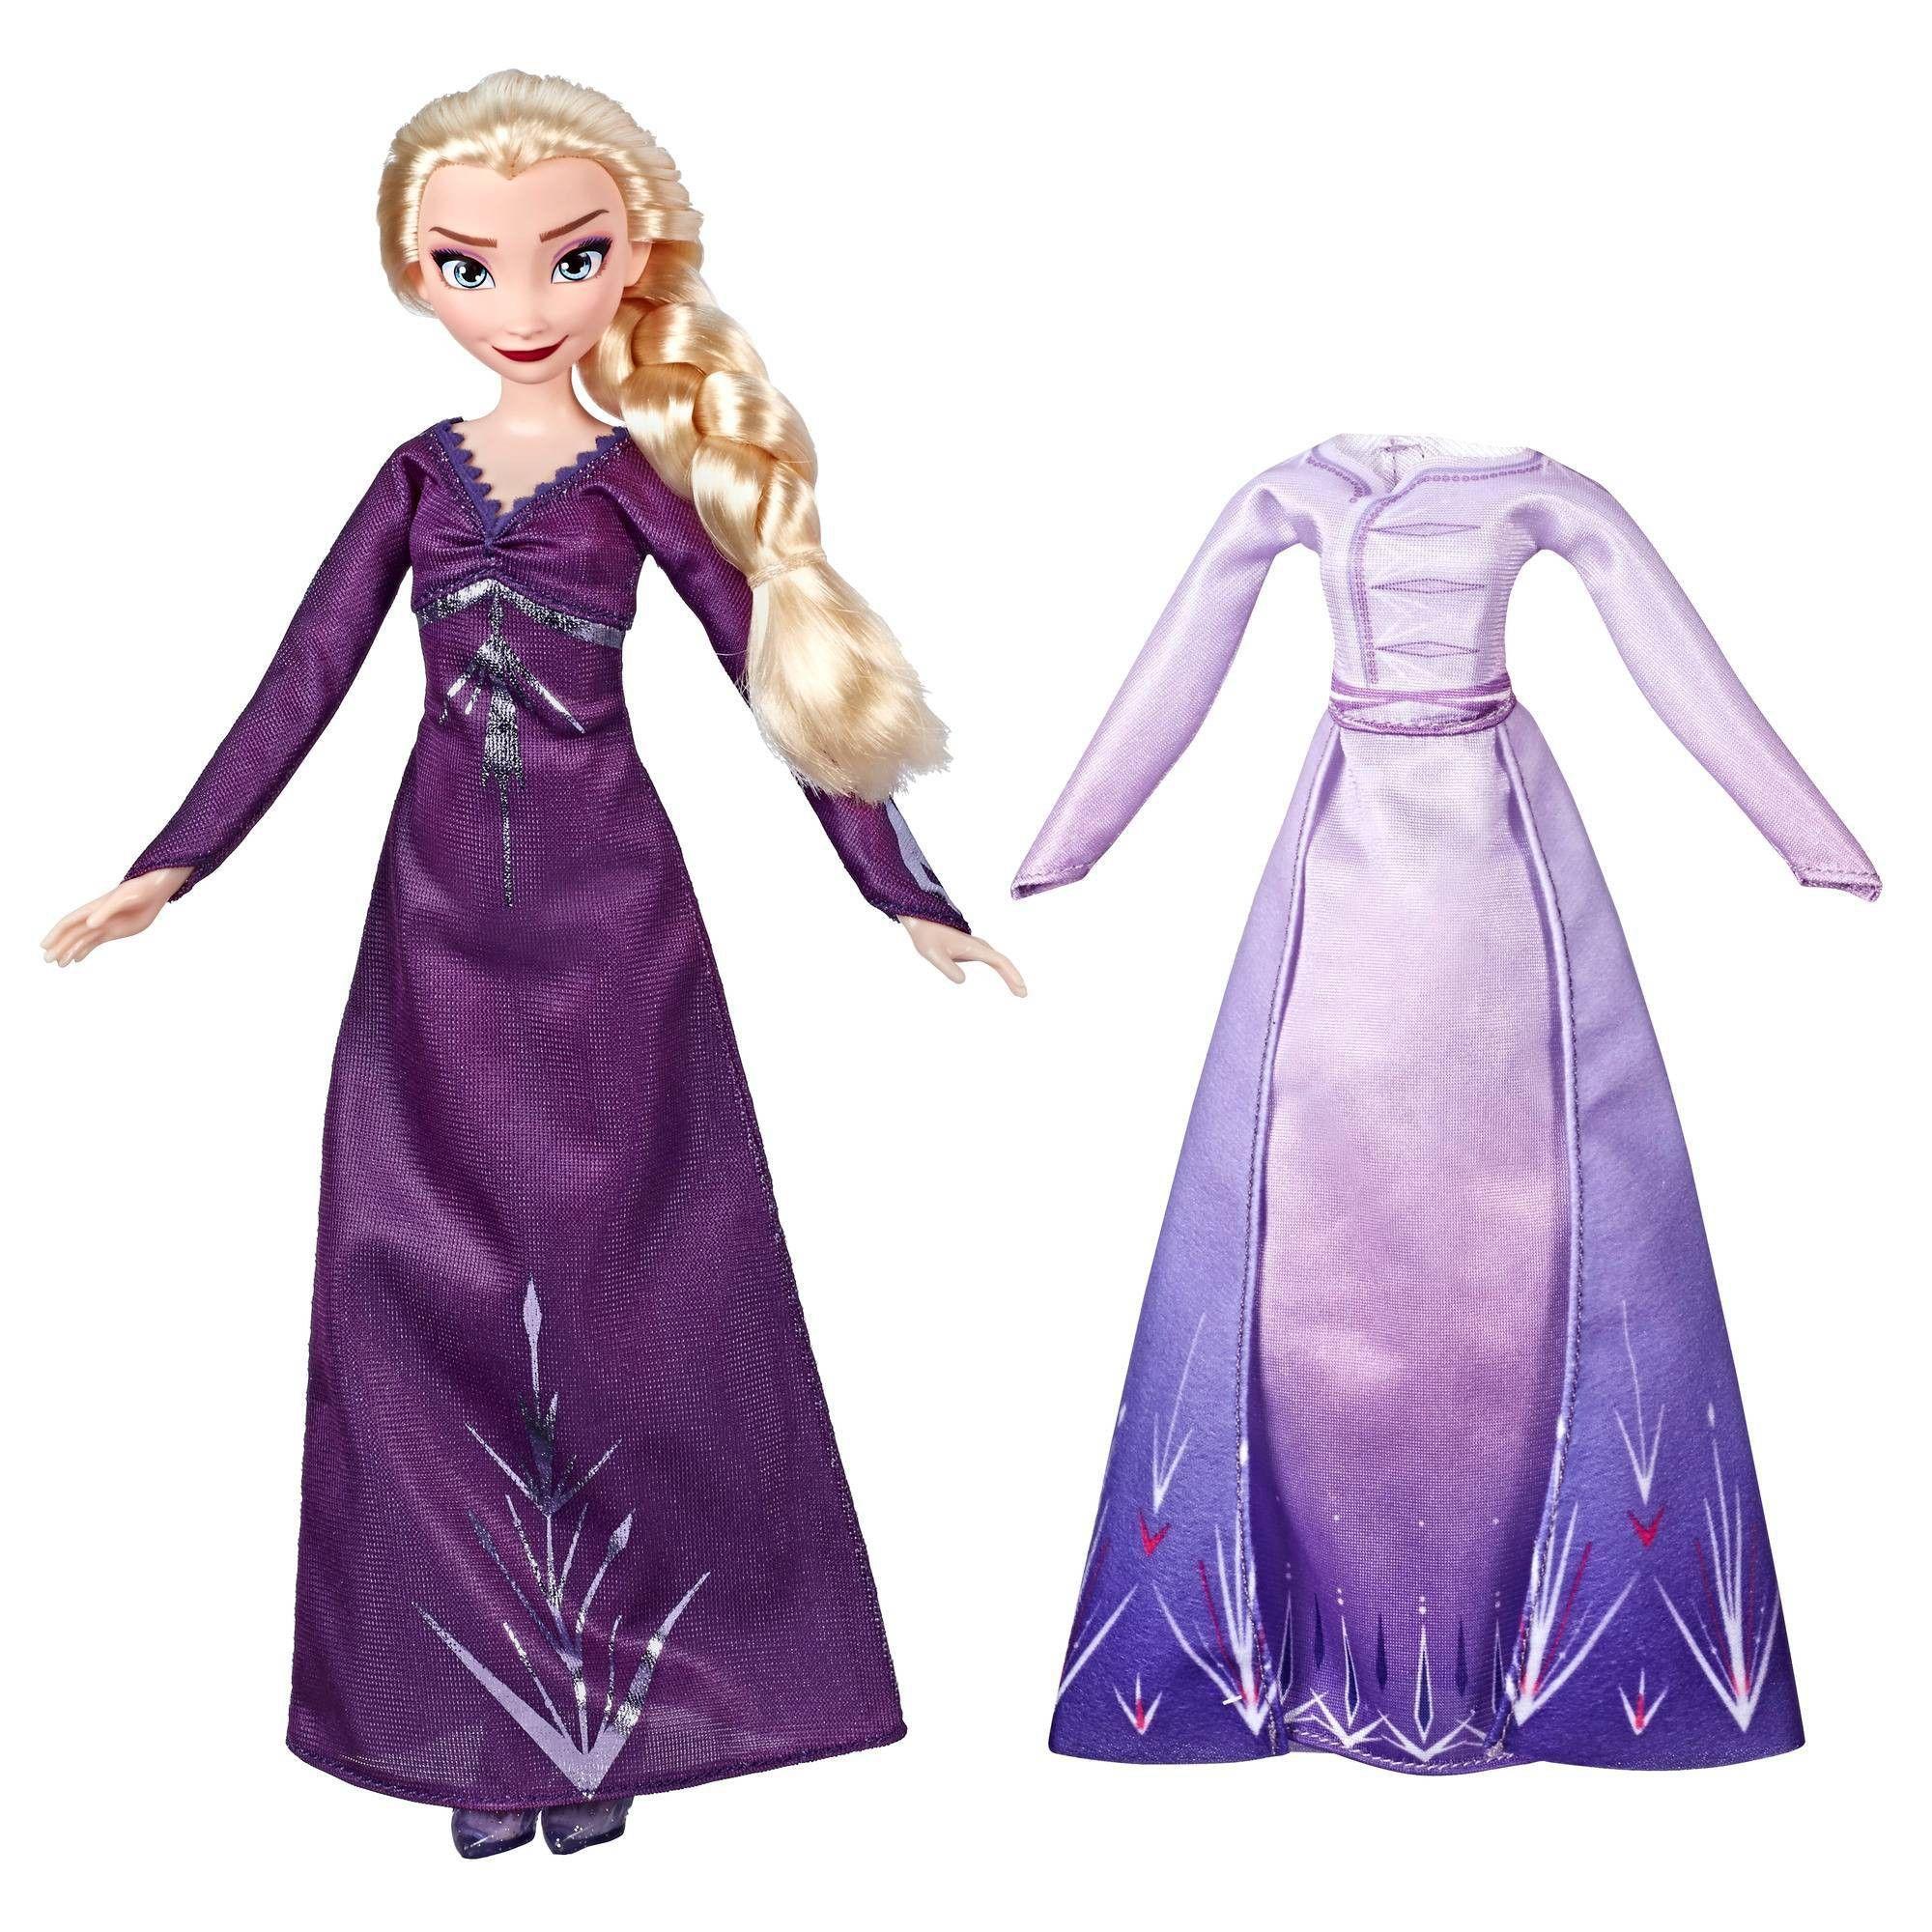 Disney Frozen 2 Arendelle Fashion Elsa | Disney frozen